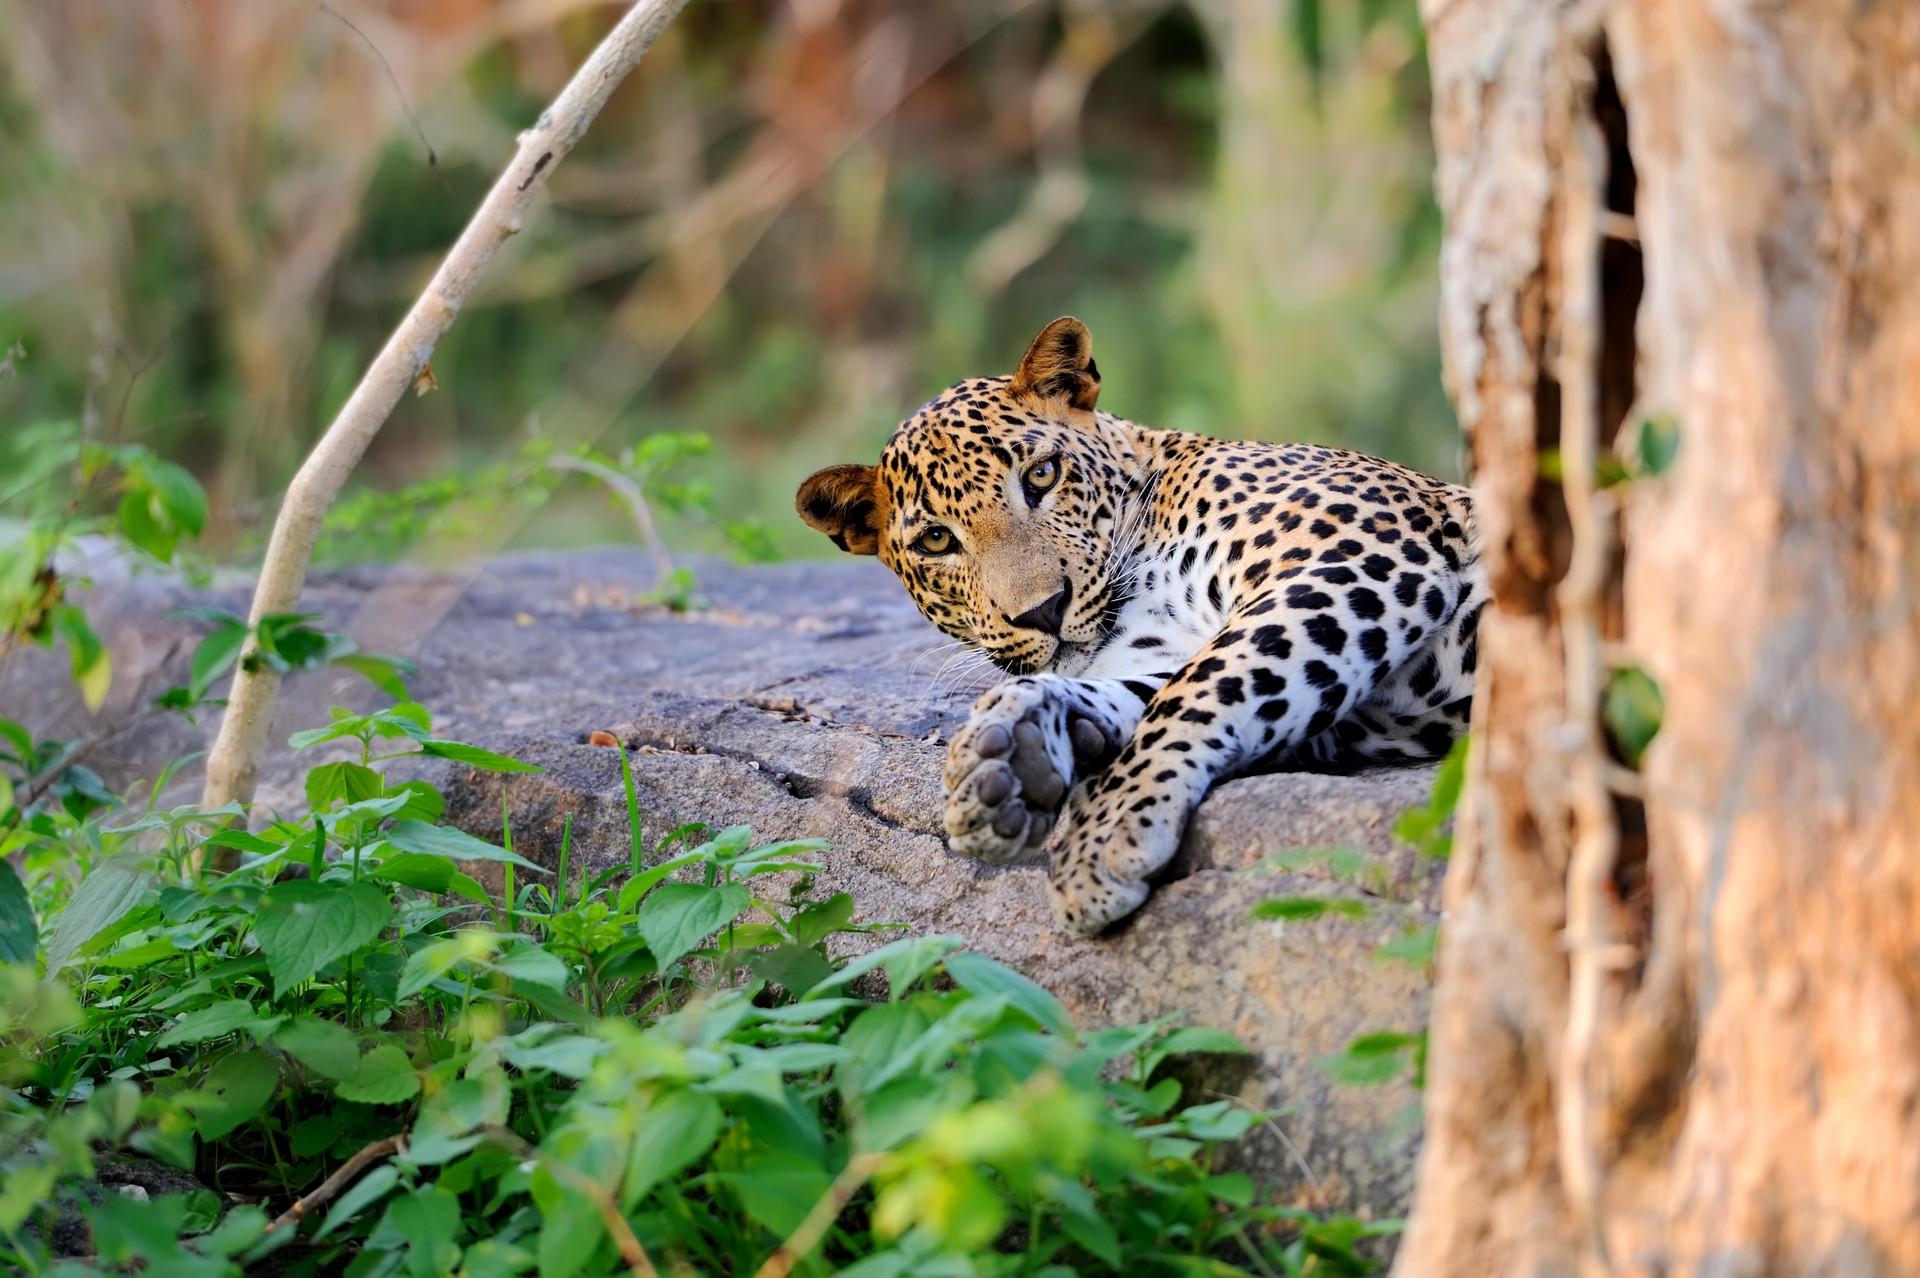 Leopard in Sri Lanka jungle